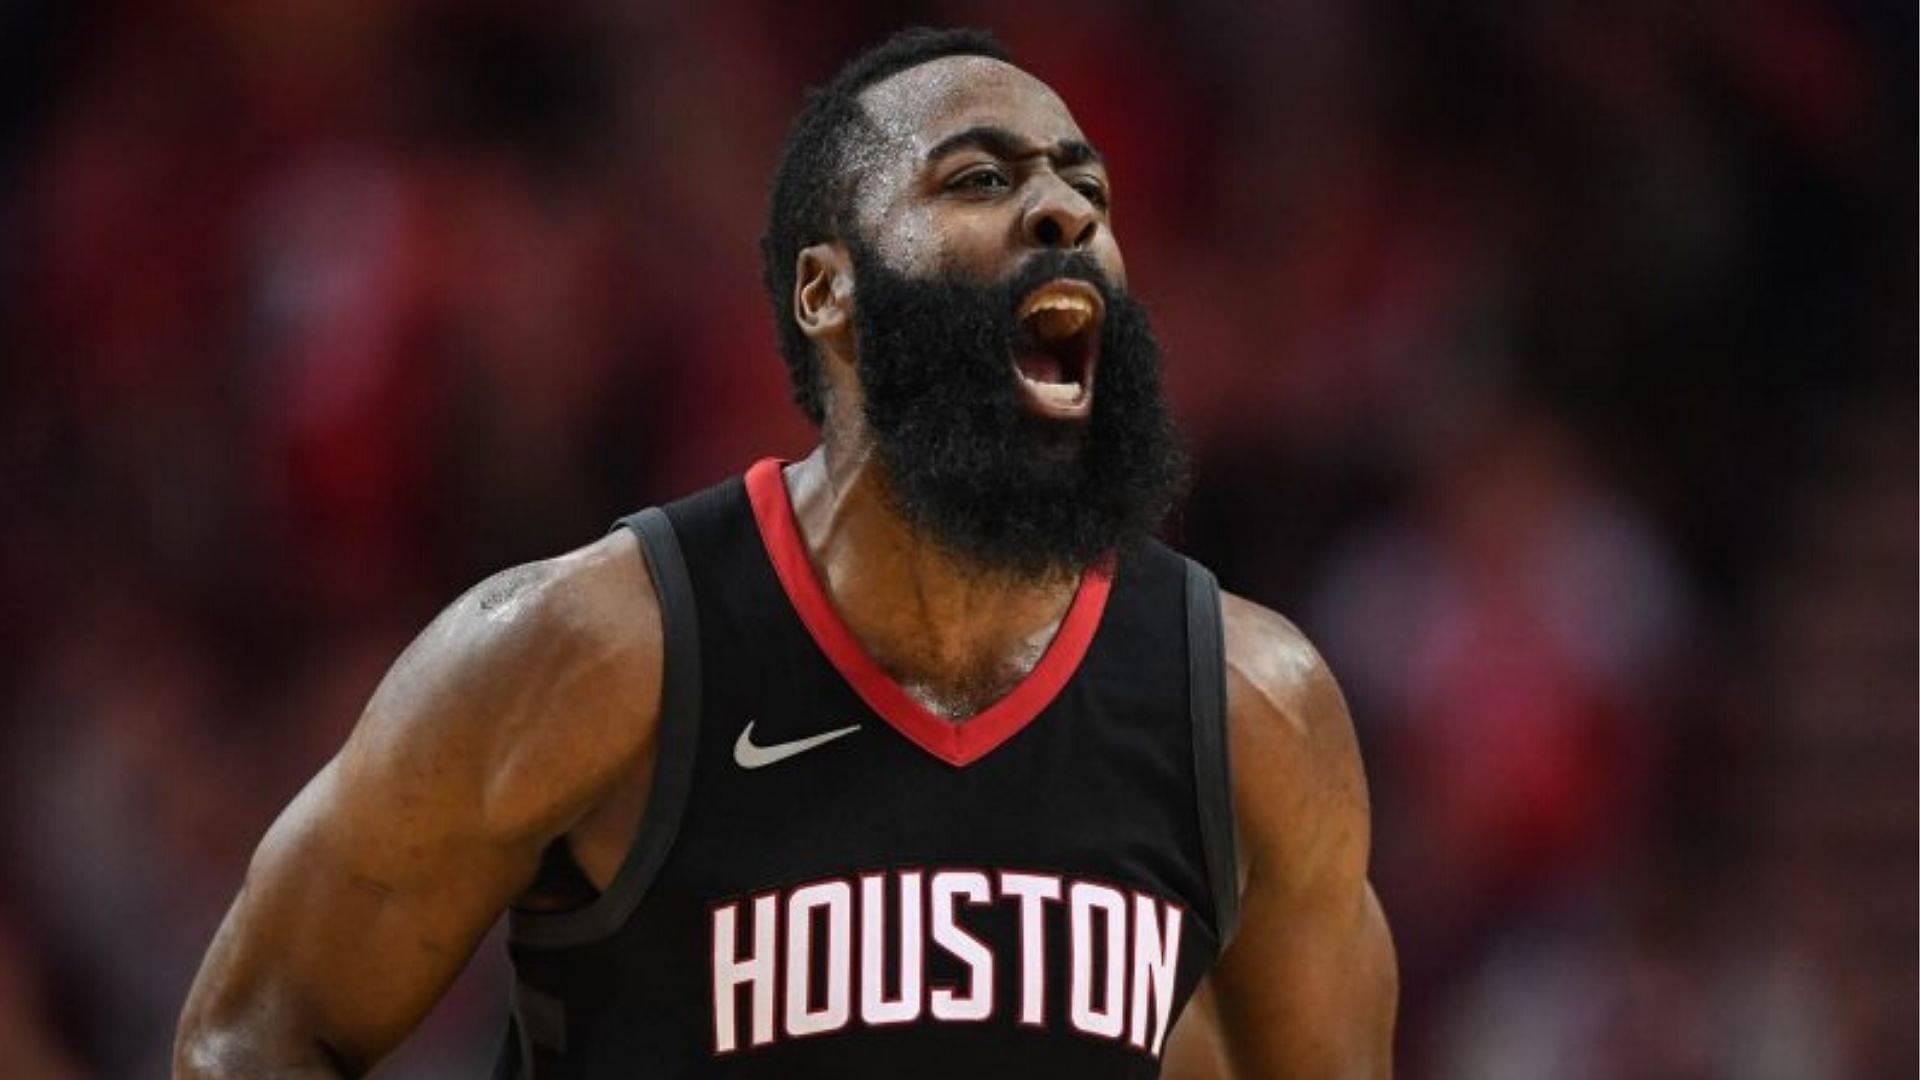 HOU Vs OKC Dream11 Prediction: Houston Rockets Vs Oklahoma City Thunder Best Dream 11 Team for NBA 2019-20 Match